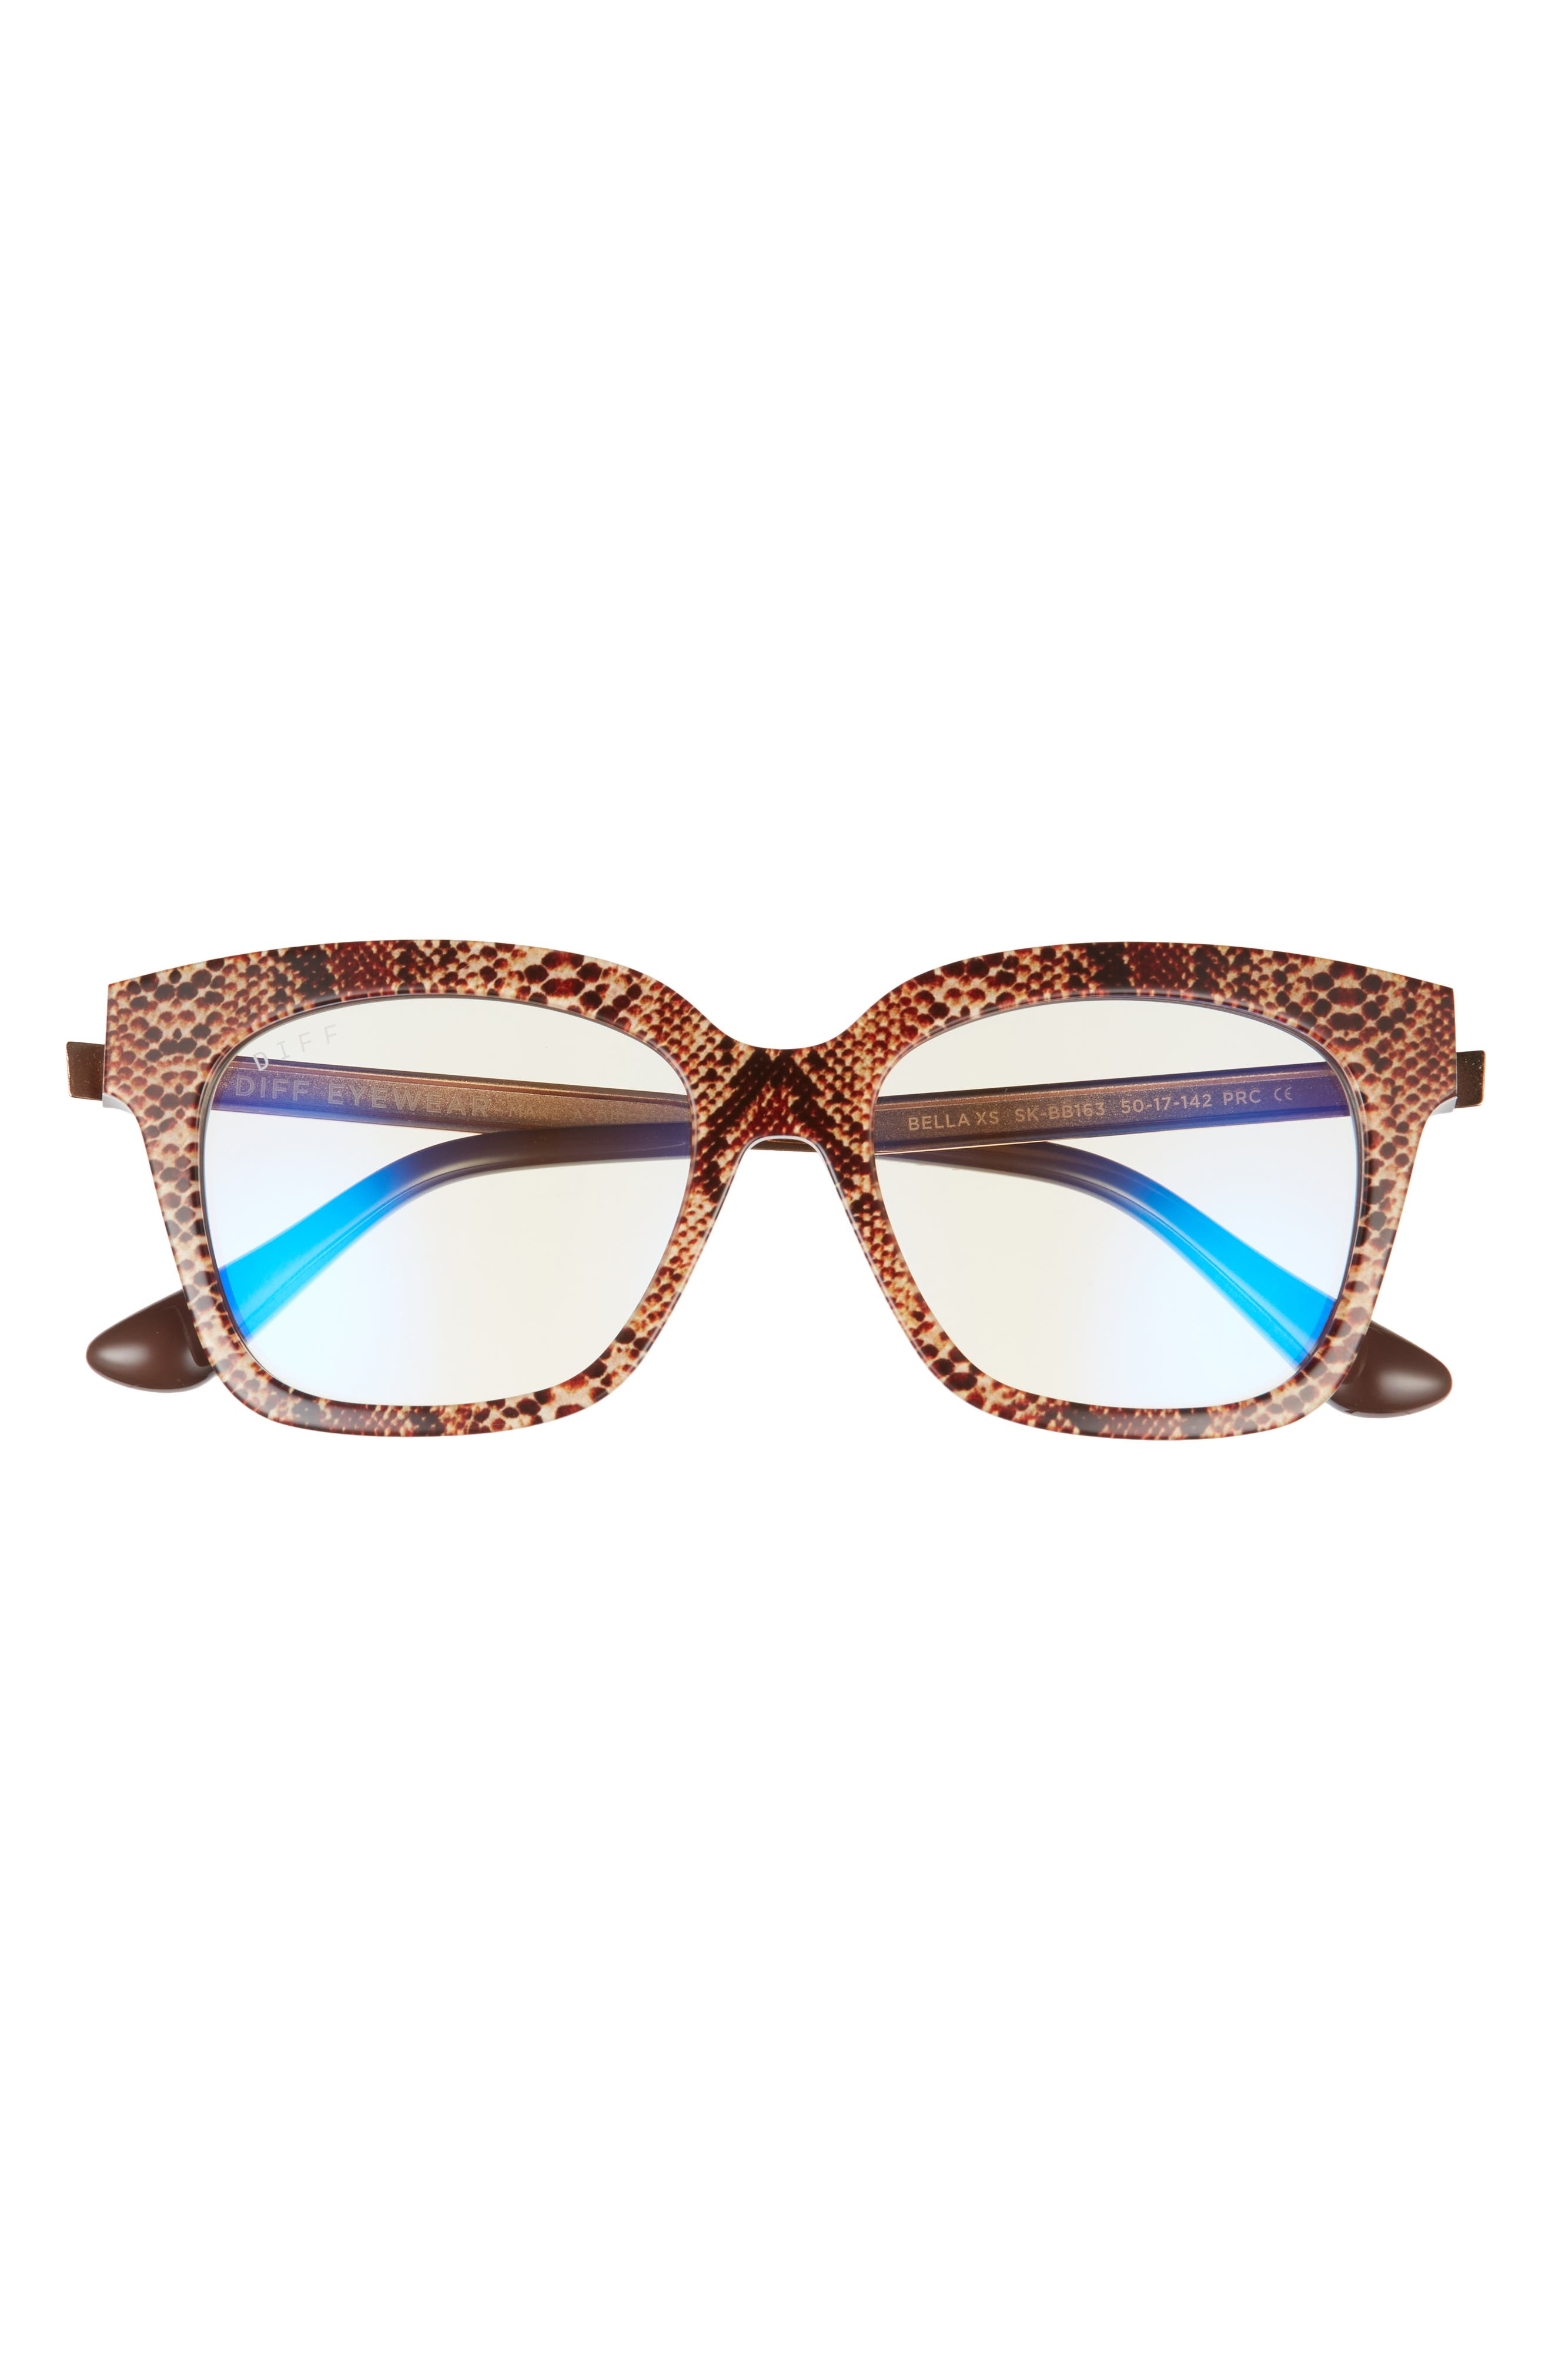 Bella 50mm Round Blue Light Blocking Glasses